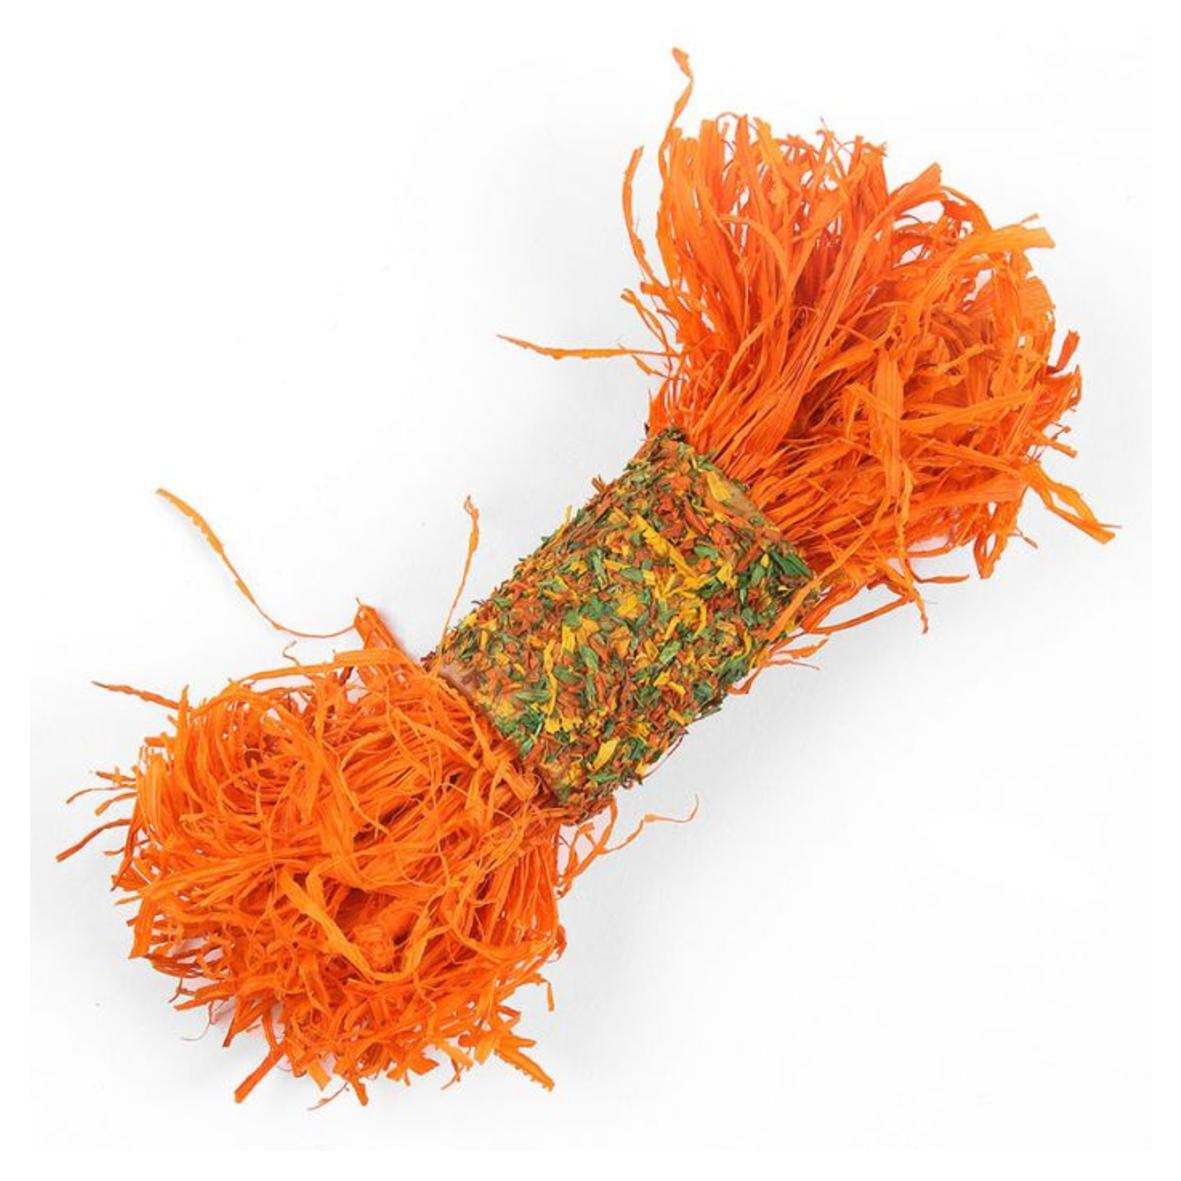 Critters Choice Shreddy Roller Carrot 15cm